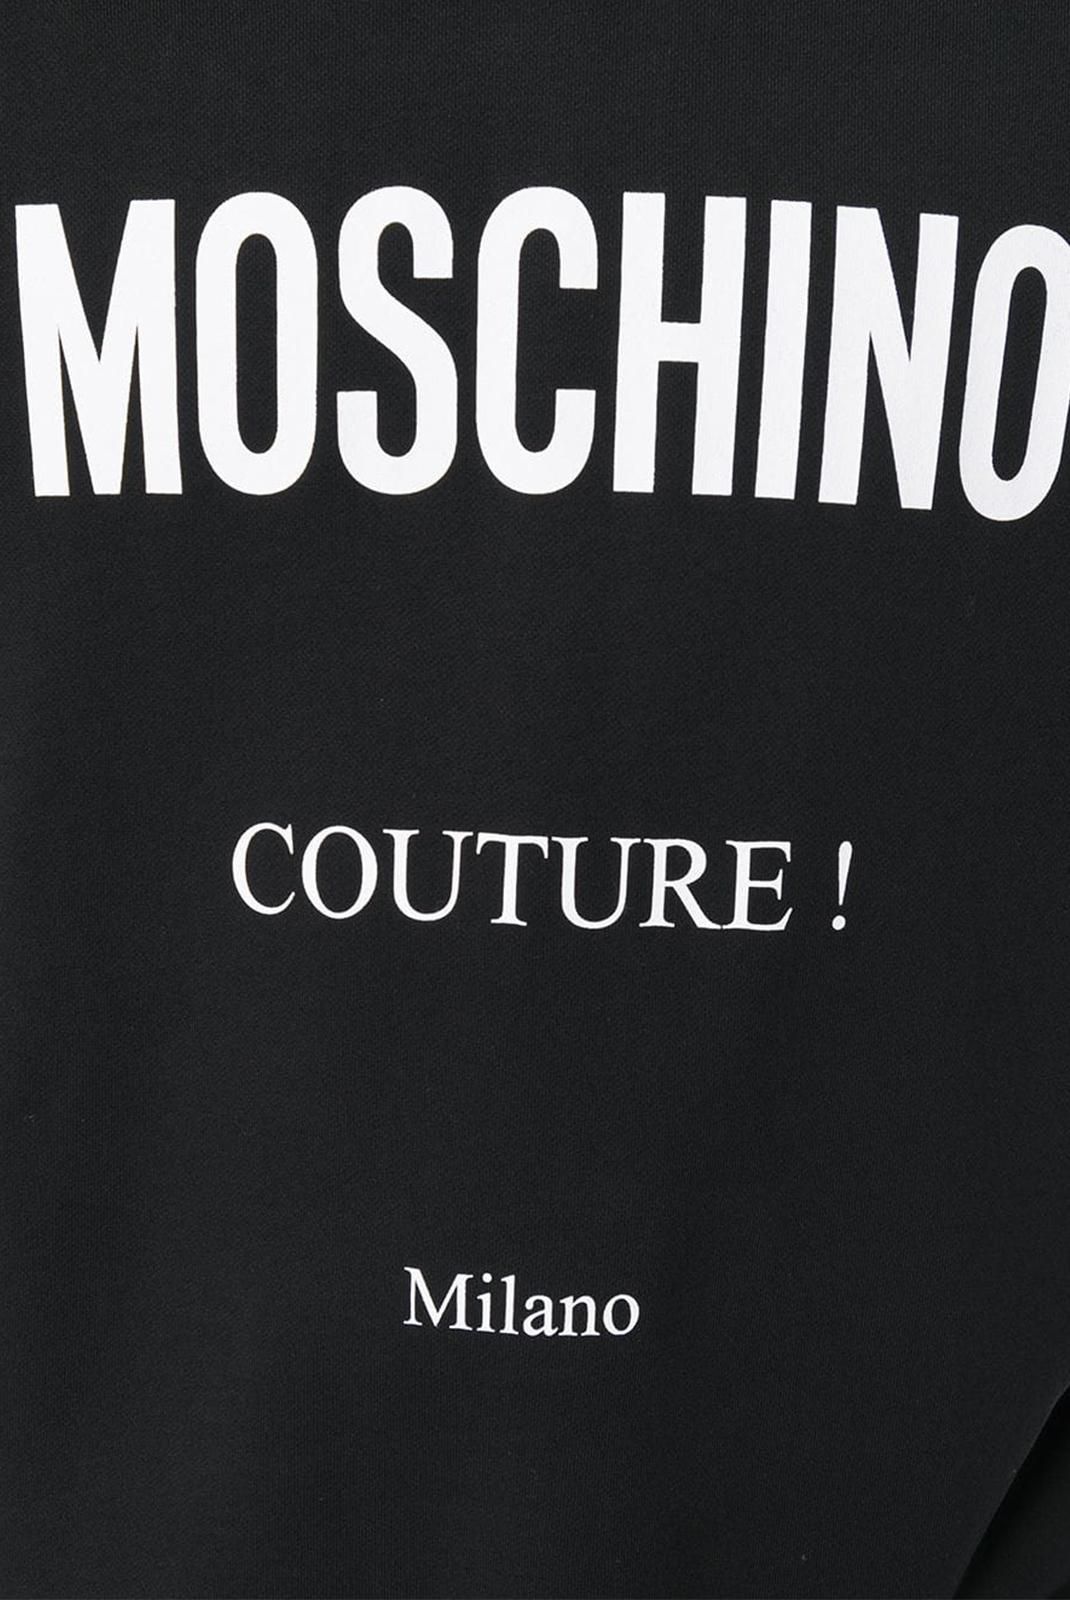 HOMME  Moschino ZA1701 5227 1555 NOIR/BLANC